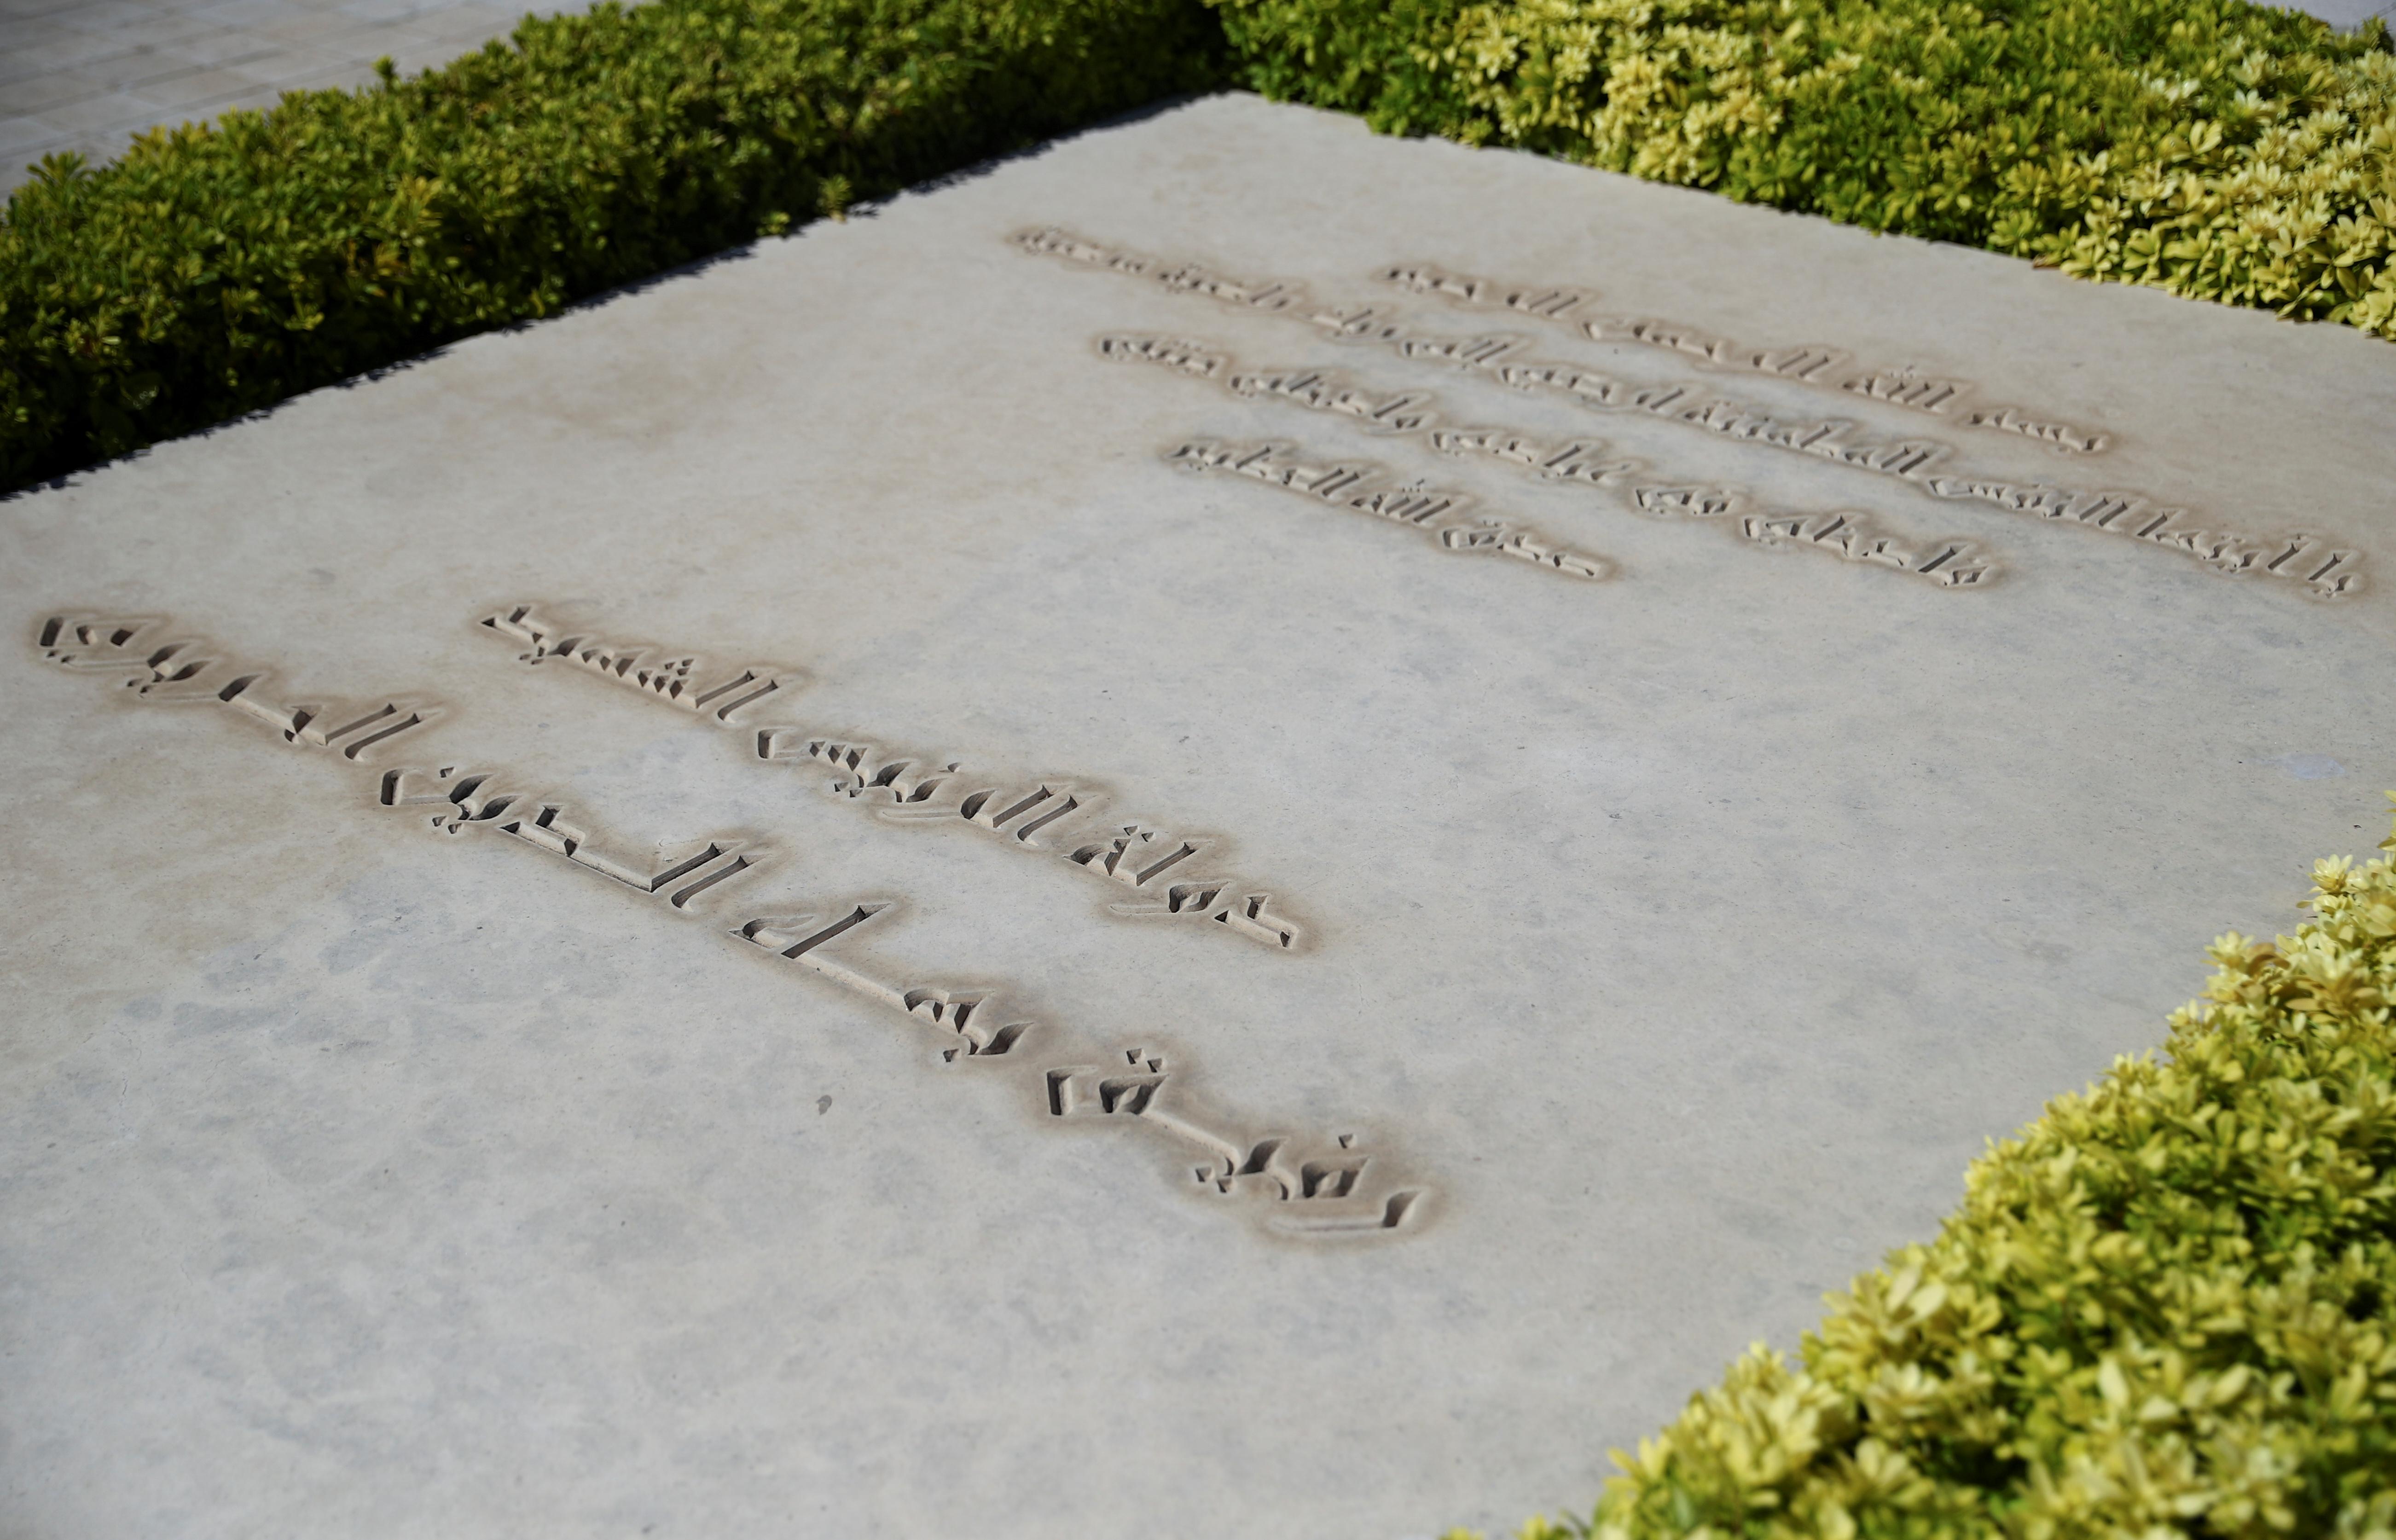 A view shows the grave of assassinated former Lebanese prime minister Rafik al-Hariri in Beirut, Lebanon, August 18, 2020. REUTERS/Hannah McKay